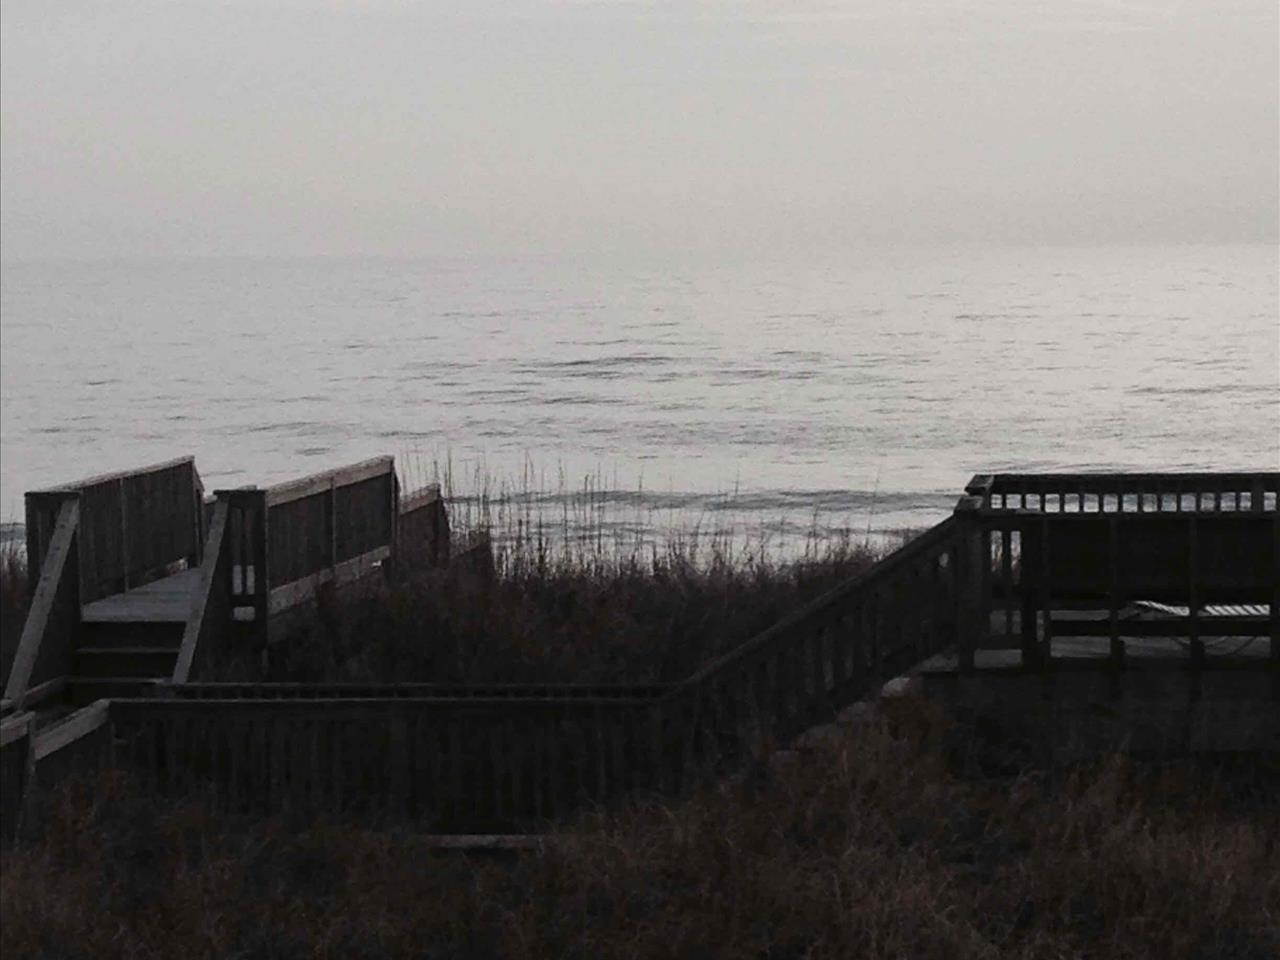 April 2015 Stay - JR16 - Beachcomber, Lisa Turner